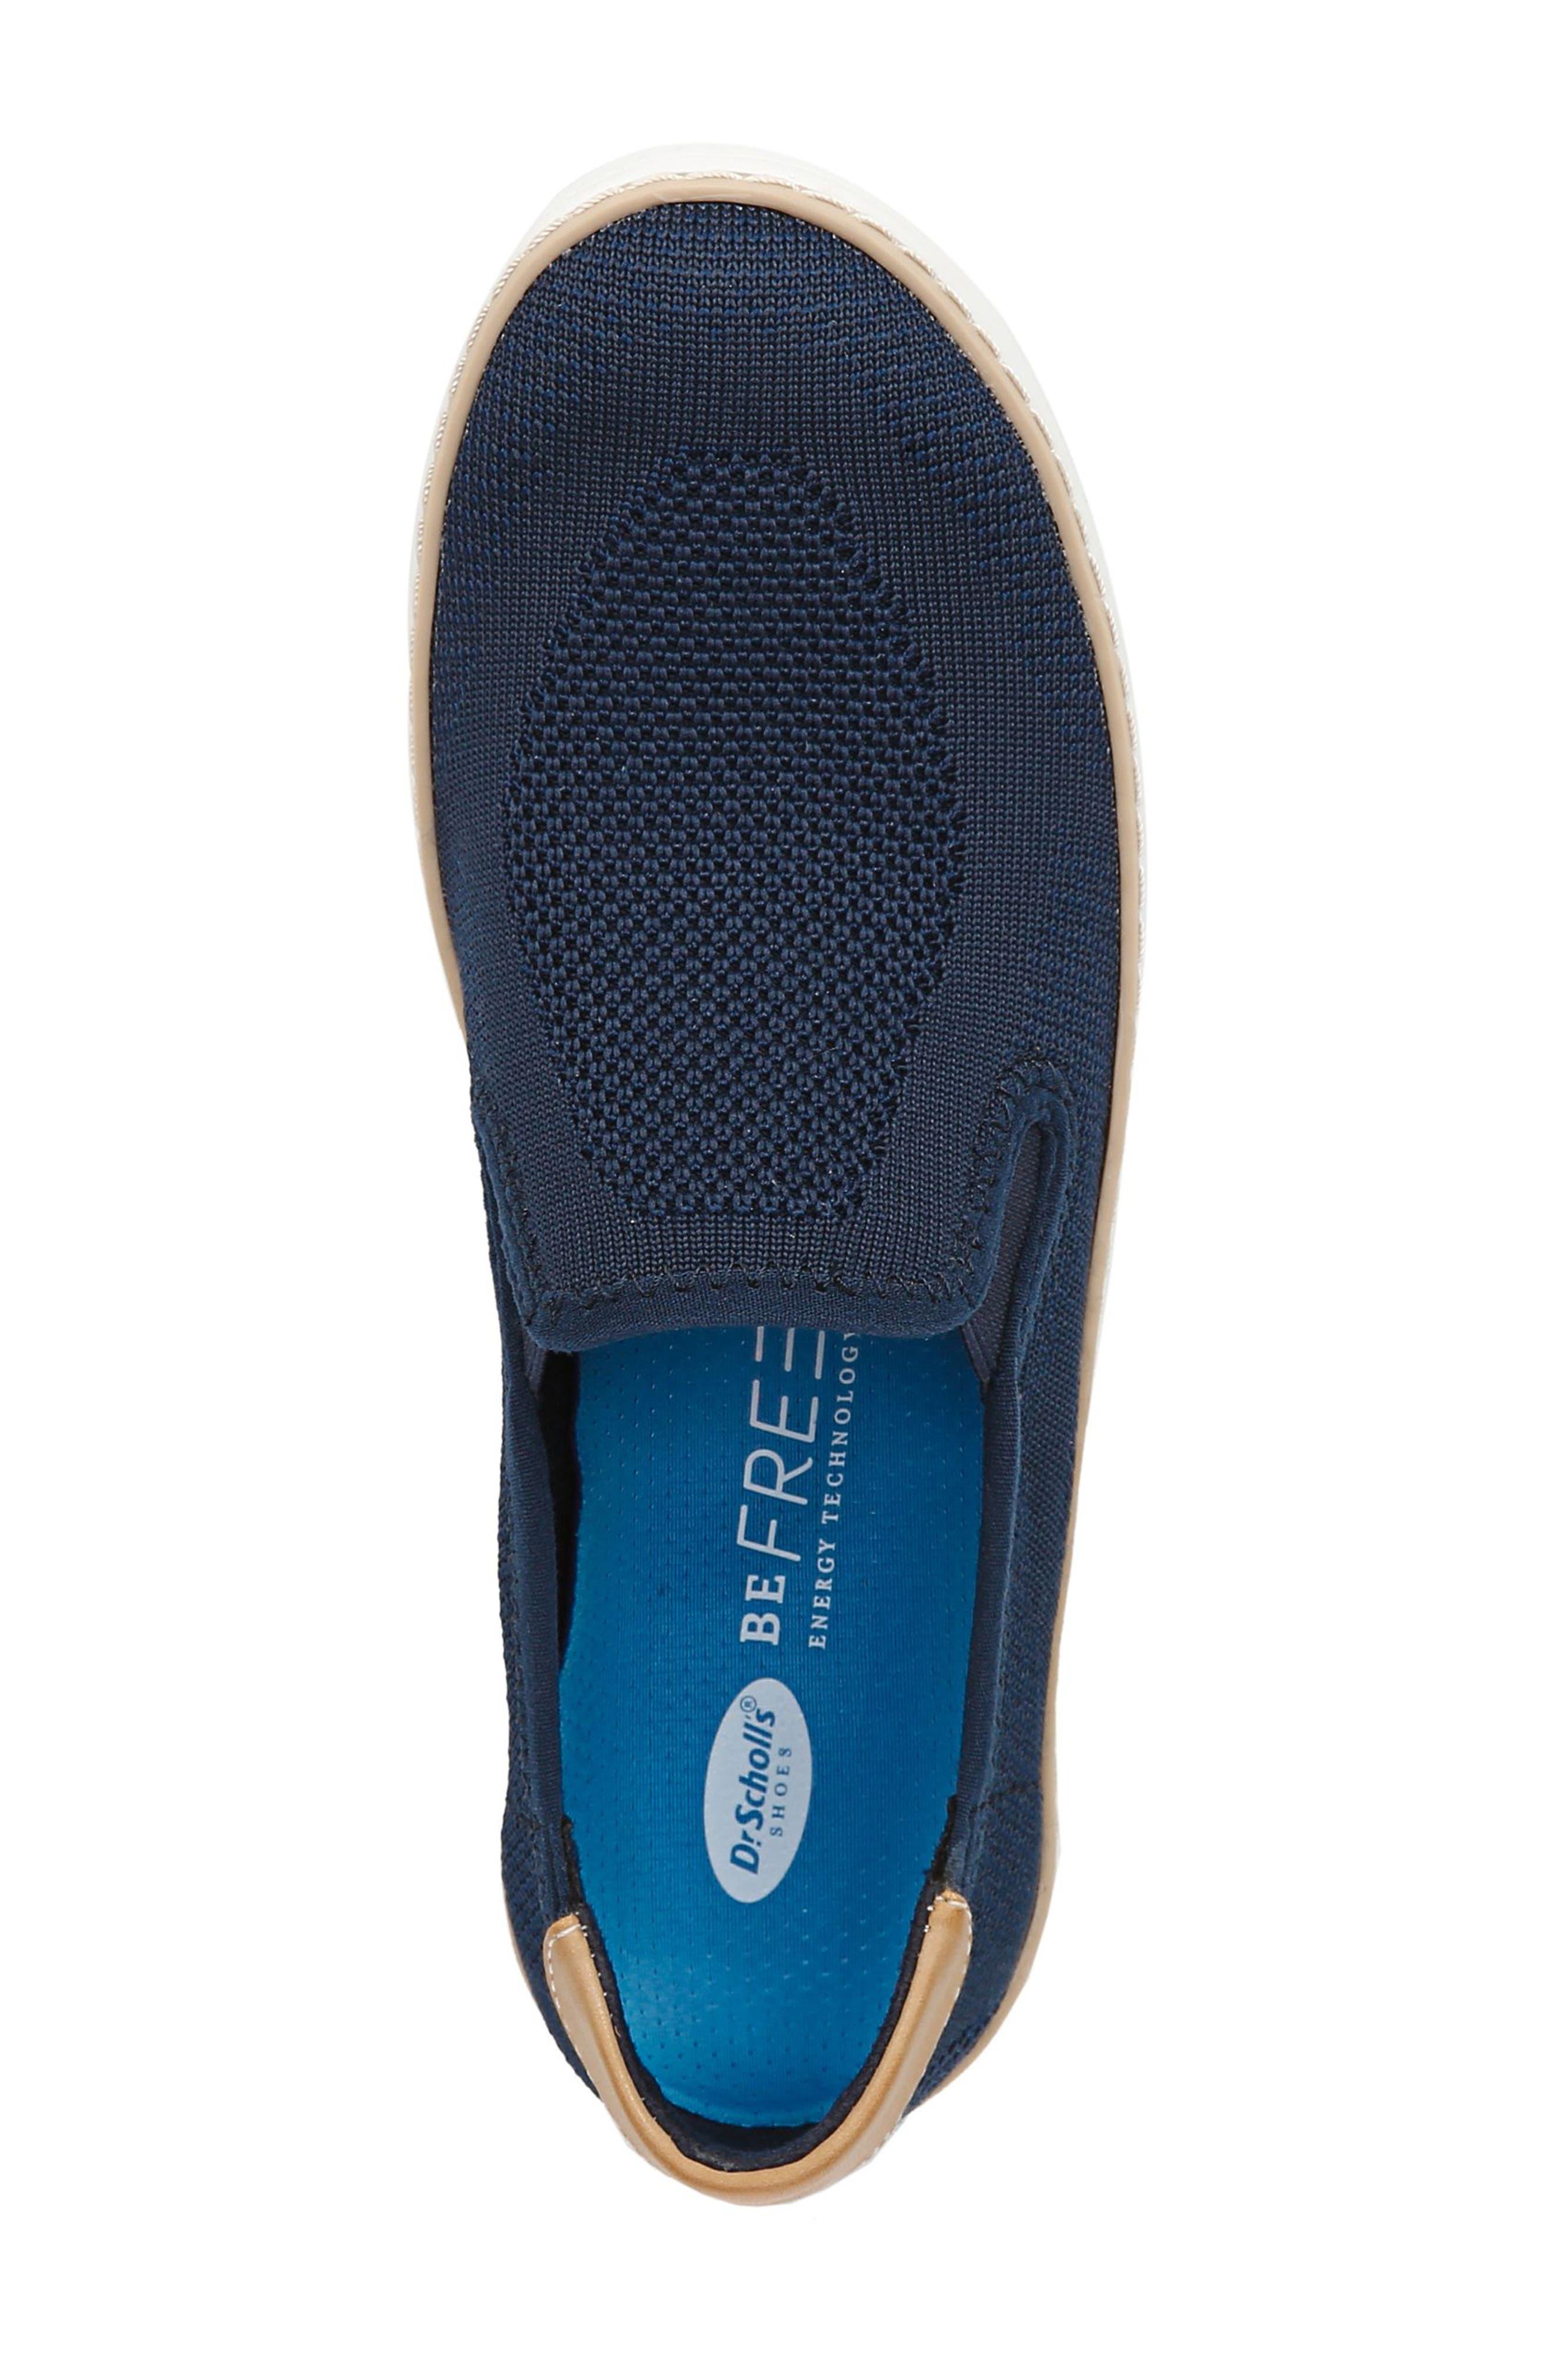 DR. SCHOLL'S, Madi Slip-On Sneaker, Alternate thumbnail 5, color, NAVY KNIT FABRIC